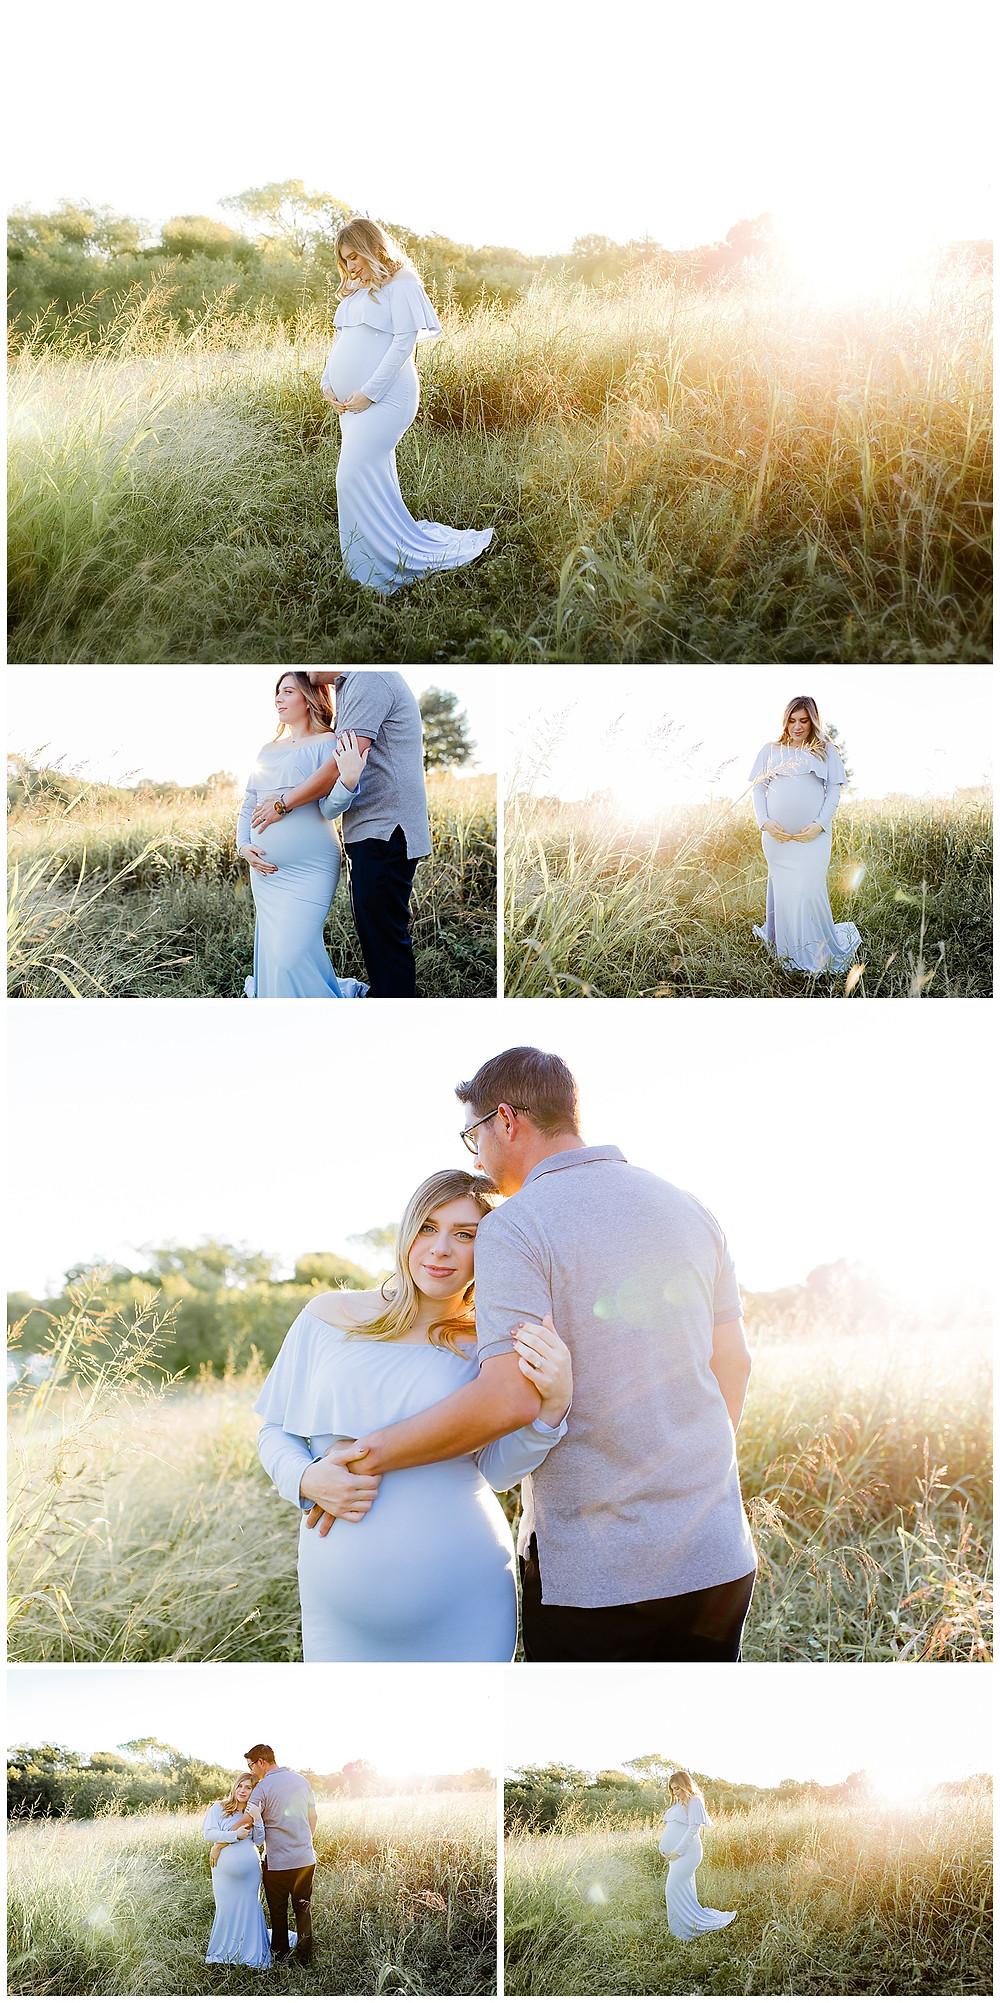 dallas maternity photographer, newborn photographer, Lexi Meadows Photography